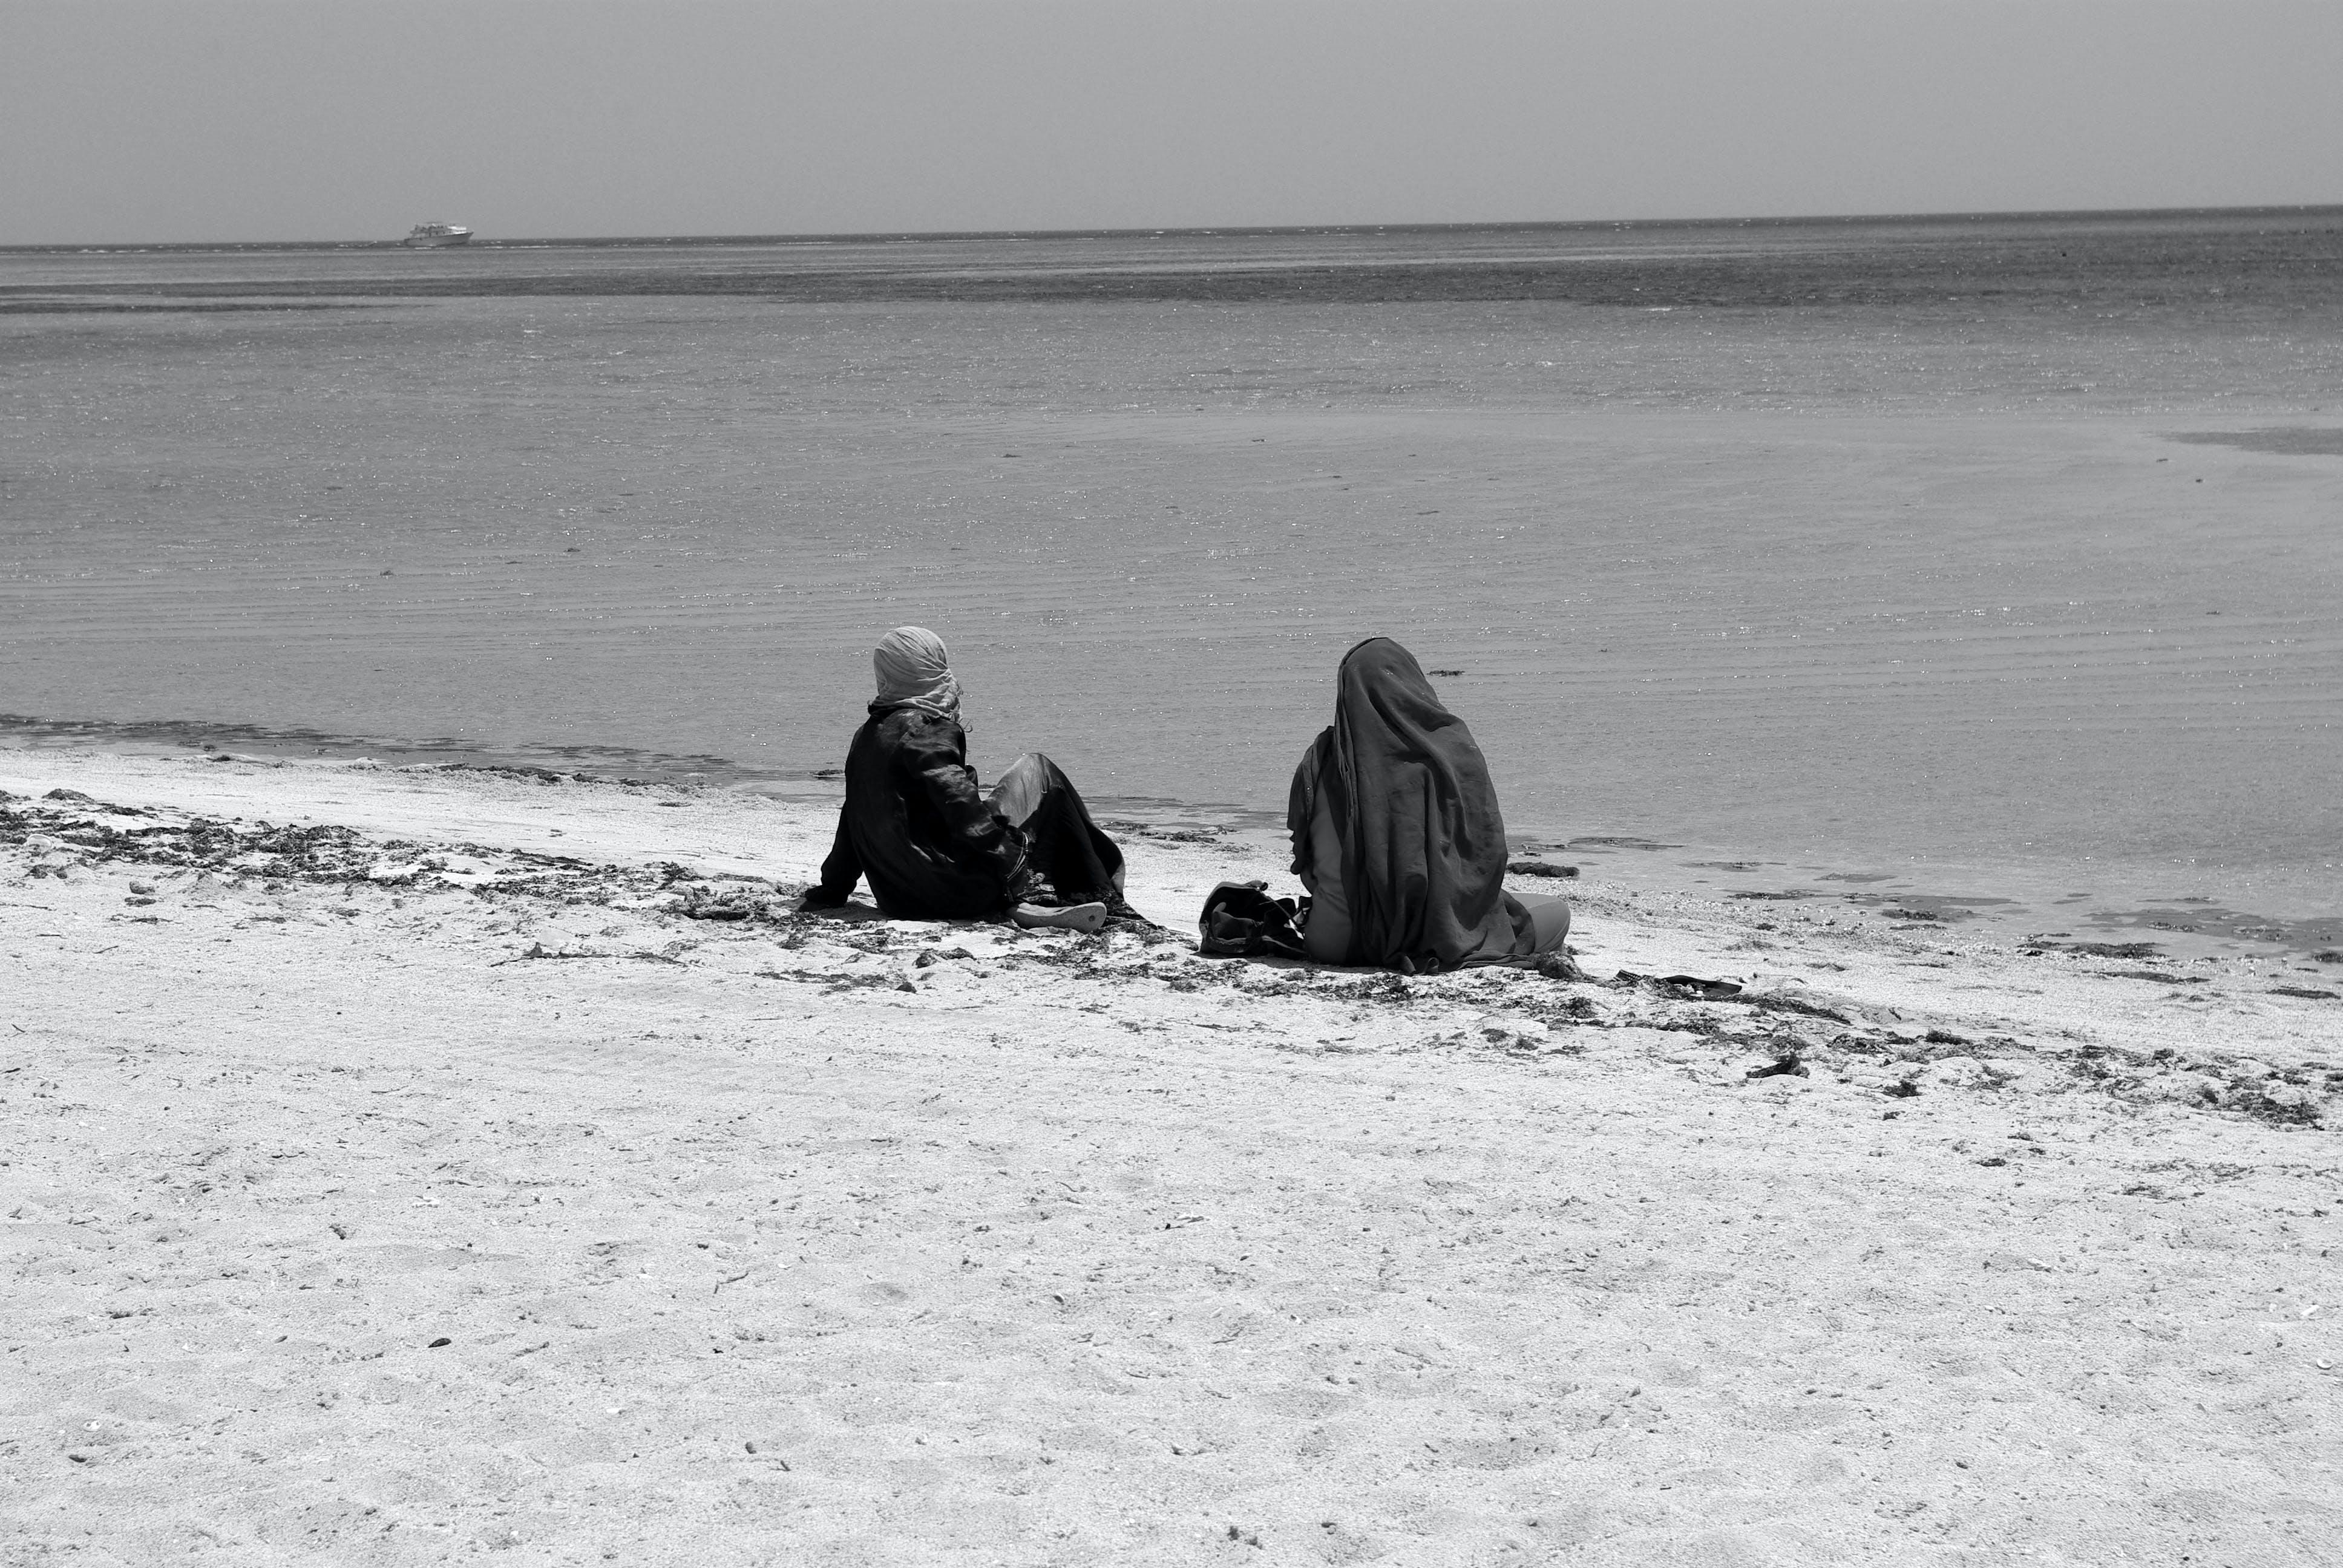 Free stock photo of beach, black and white, desert, Red sea